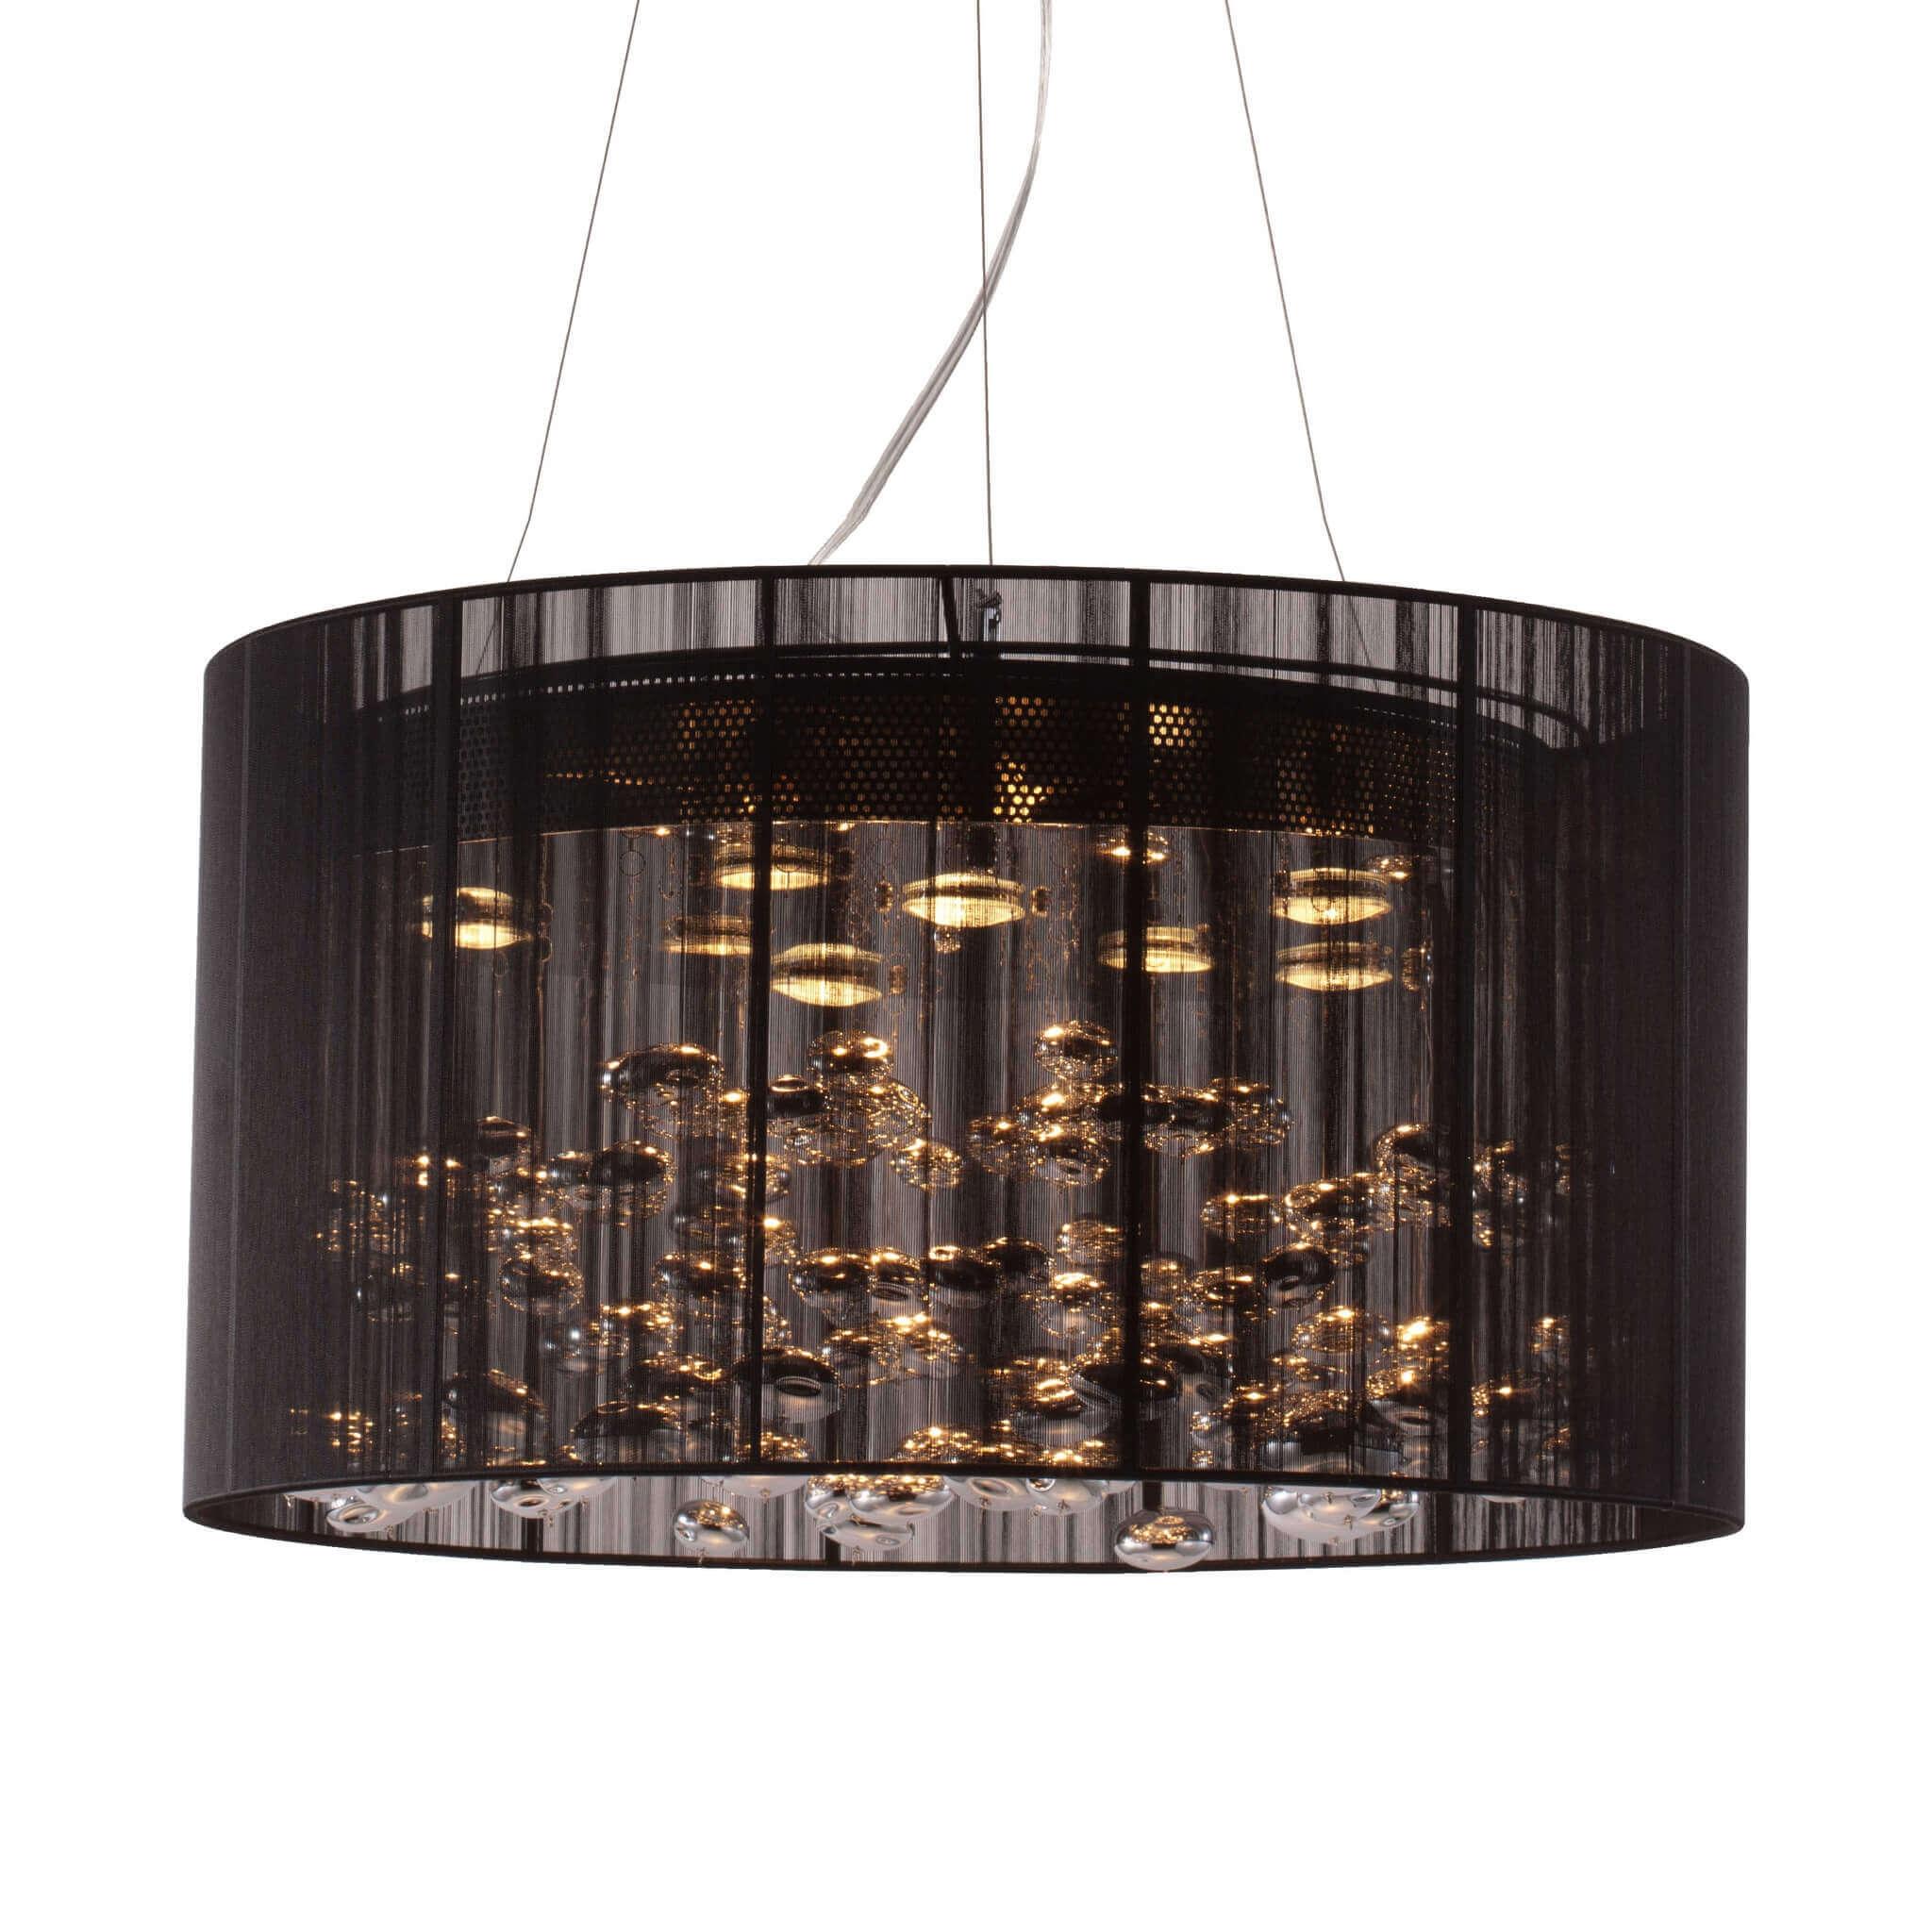 Industrial contemporary lighting Custom Kitchen Cubicles Soare Black Industrial Pendant Light